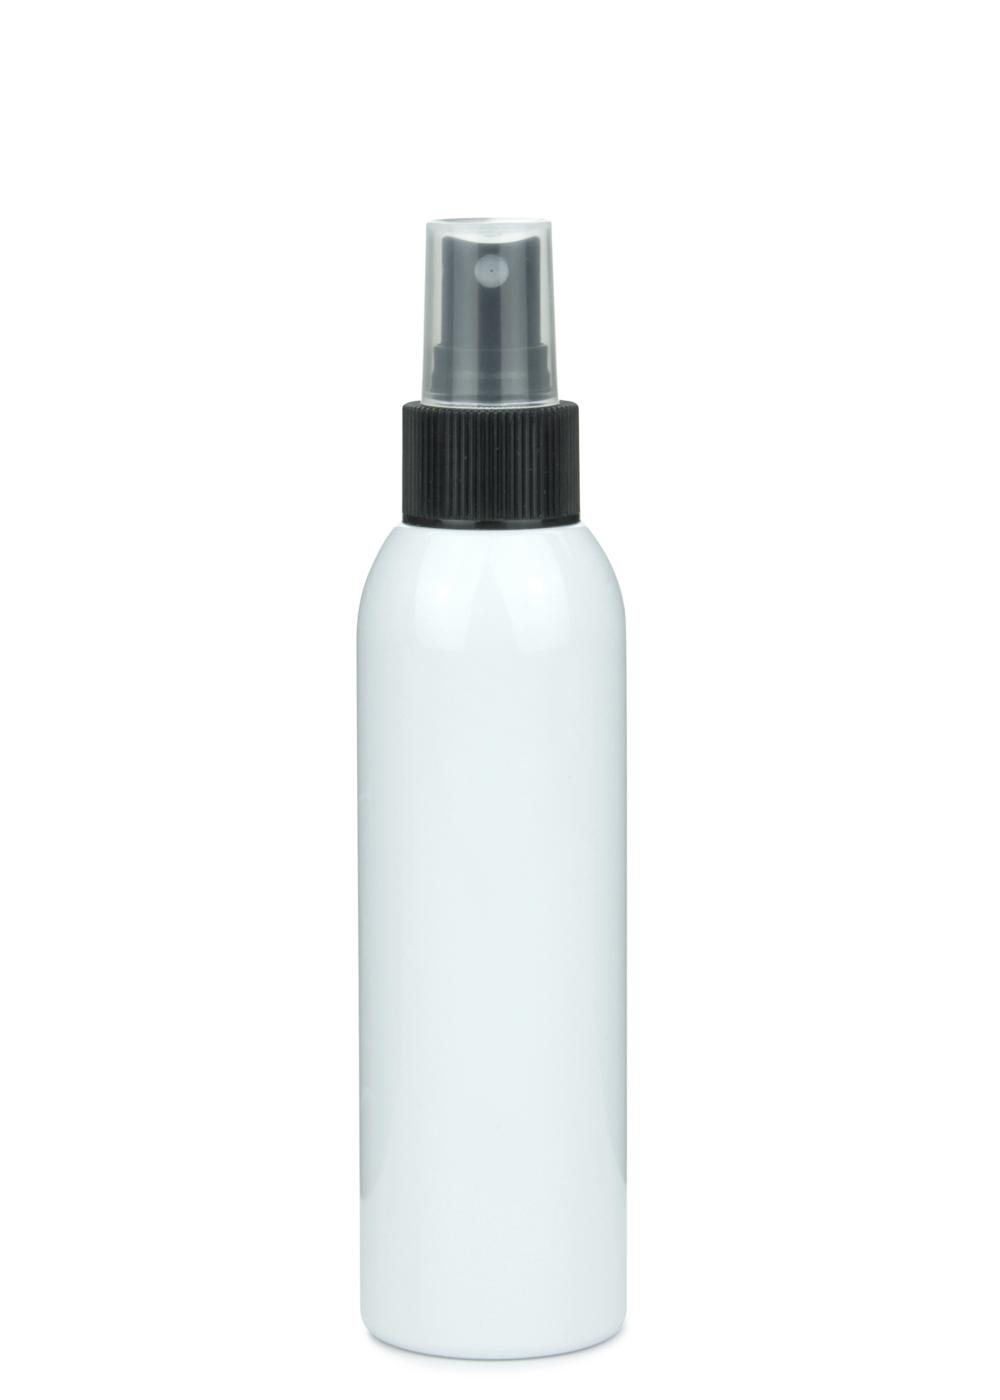 pet flasche aida 150 ml weiss inkl spray zerst uber pumpe basic 24 410 schwarz. Black Bedroom Furniture Sets. Home Design Ideas